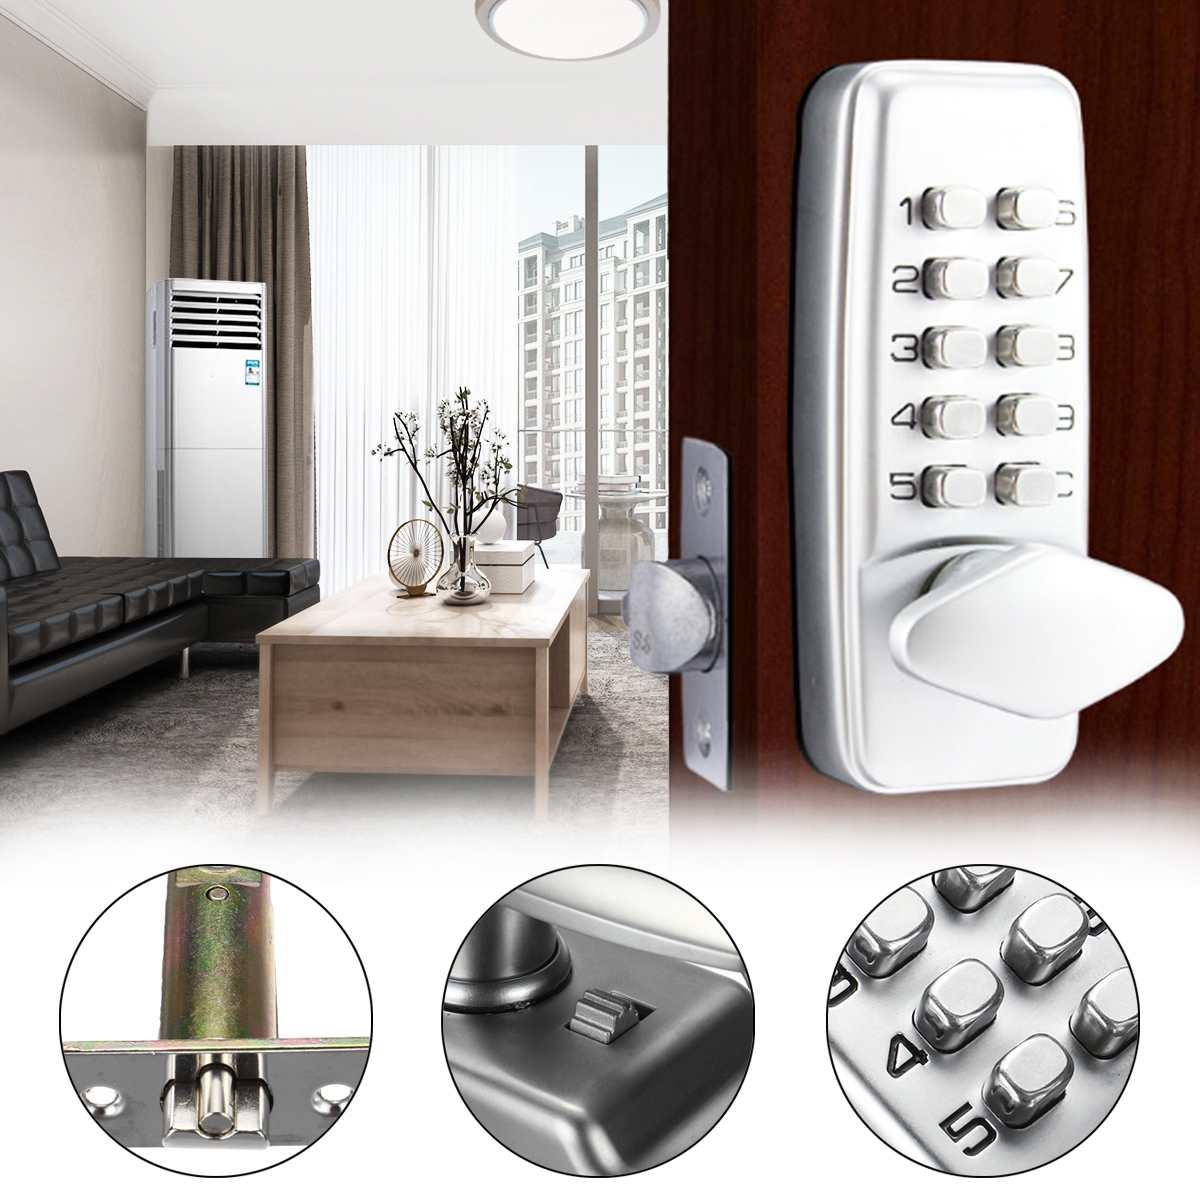 Waterproof Lever Handle Mechanical Combination Lockey Digital Numberal Deadbolt Door Coded Lock For Home Furniture Hardware